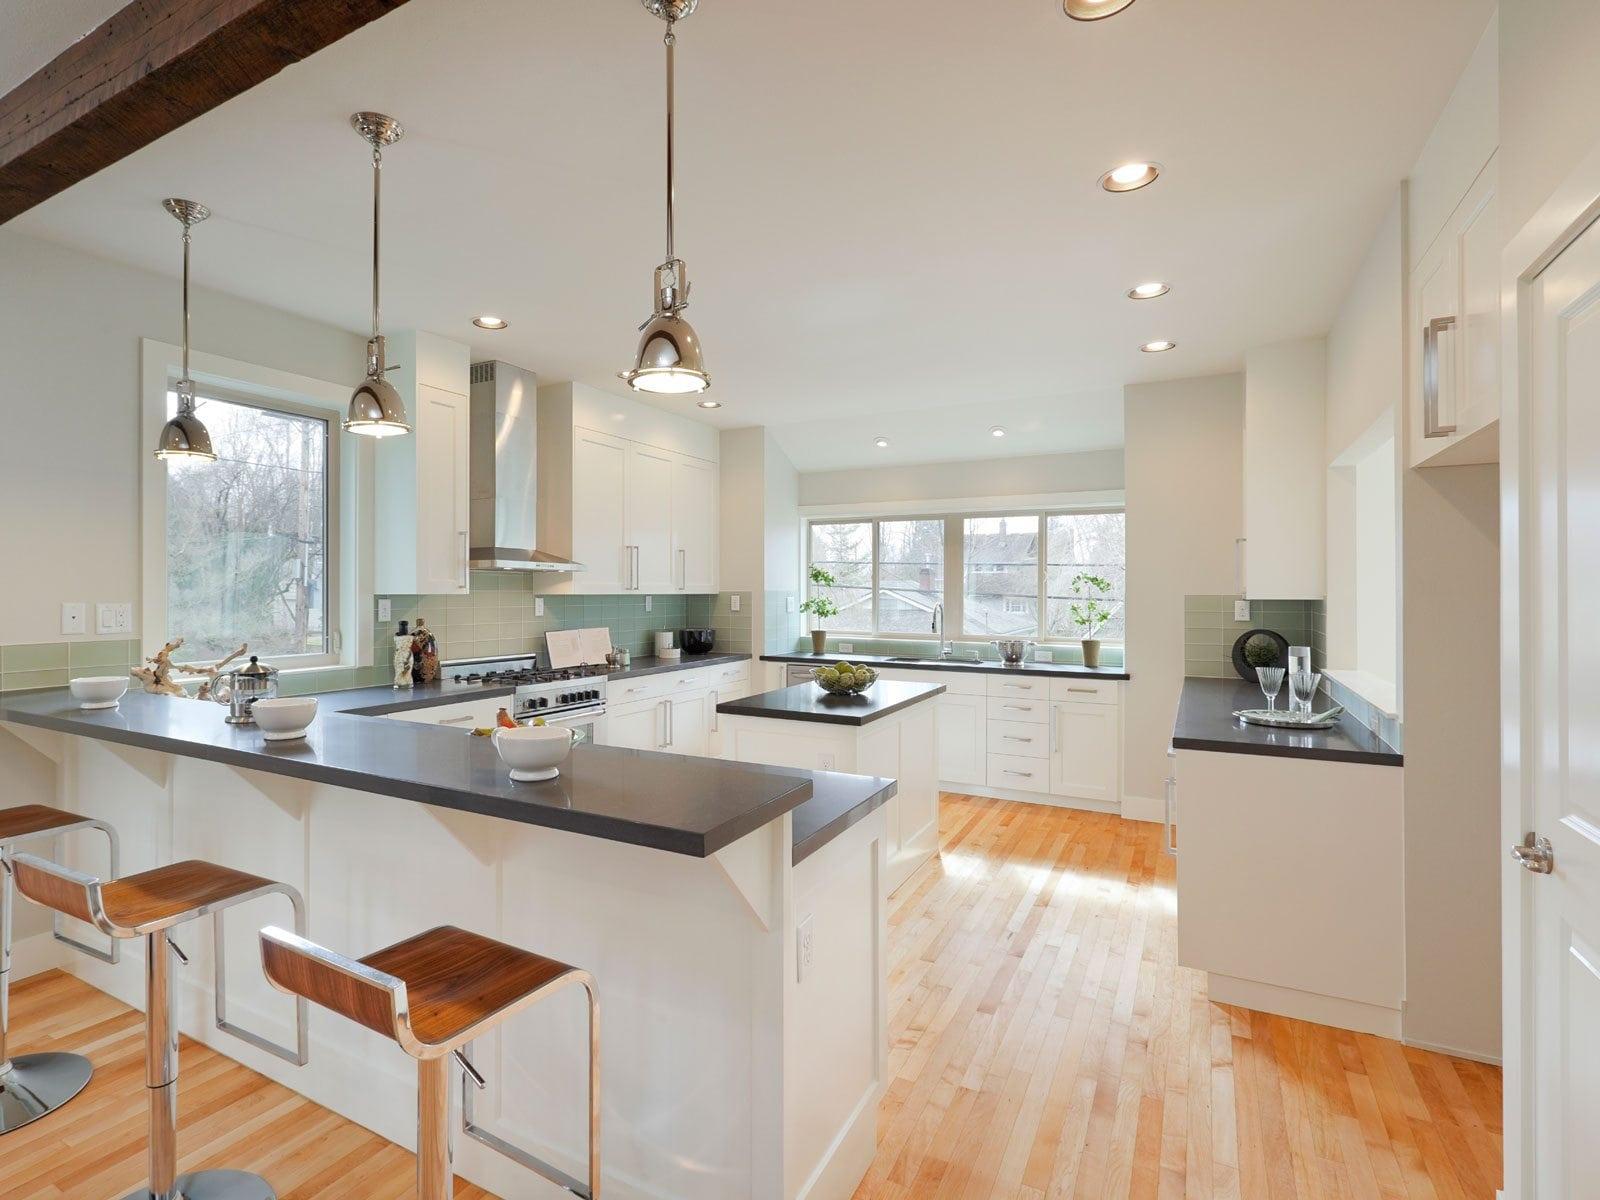 amazing builds open kitchen